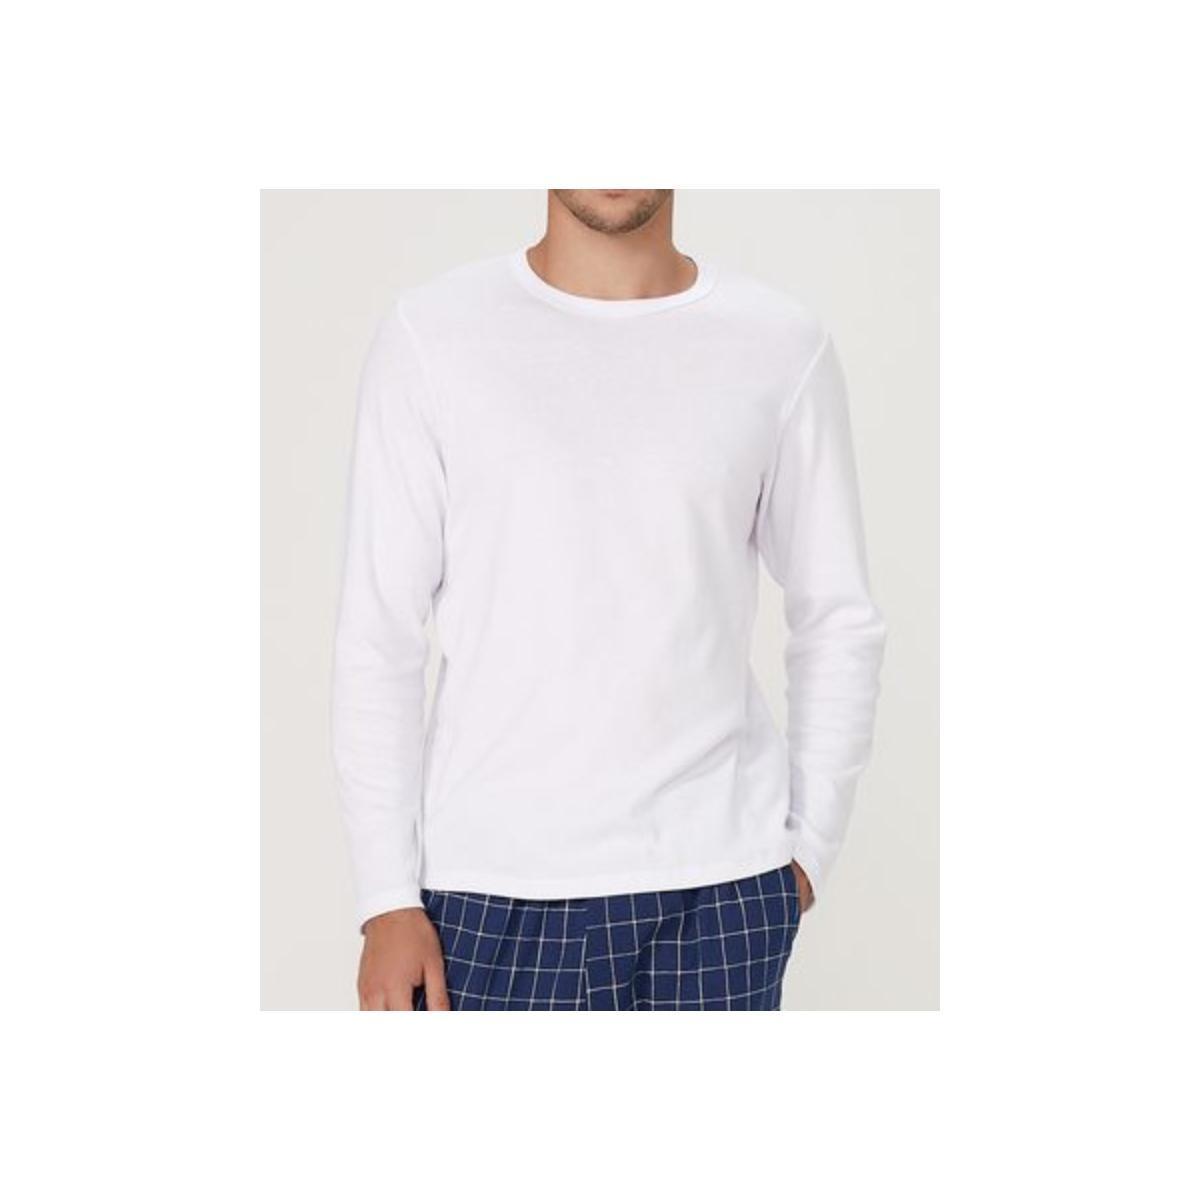 Camiseta Masculina Hering 7cep N0aen Branco